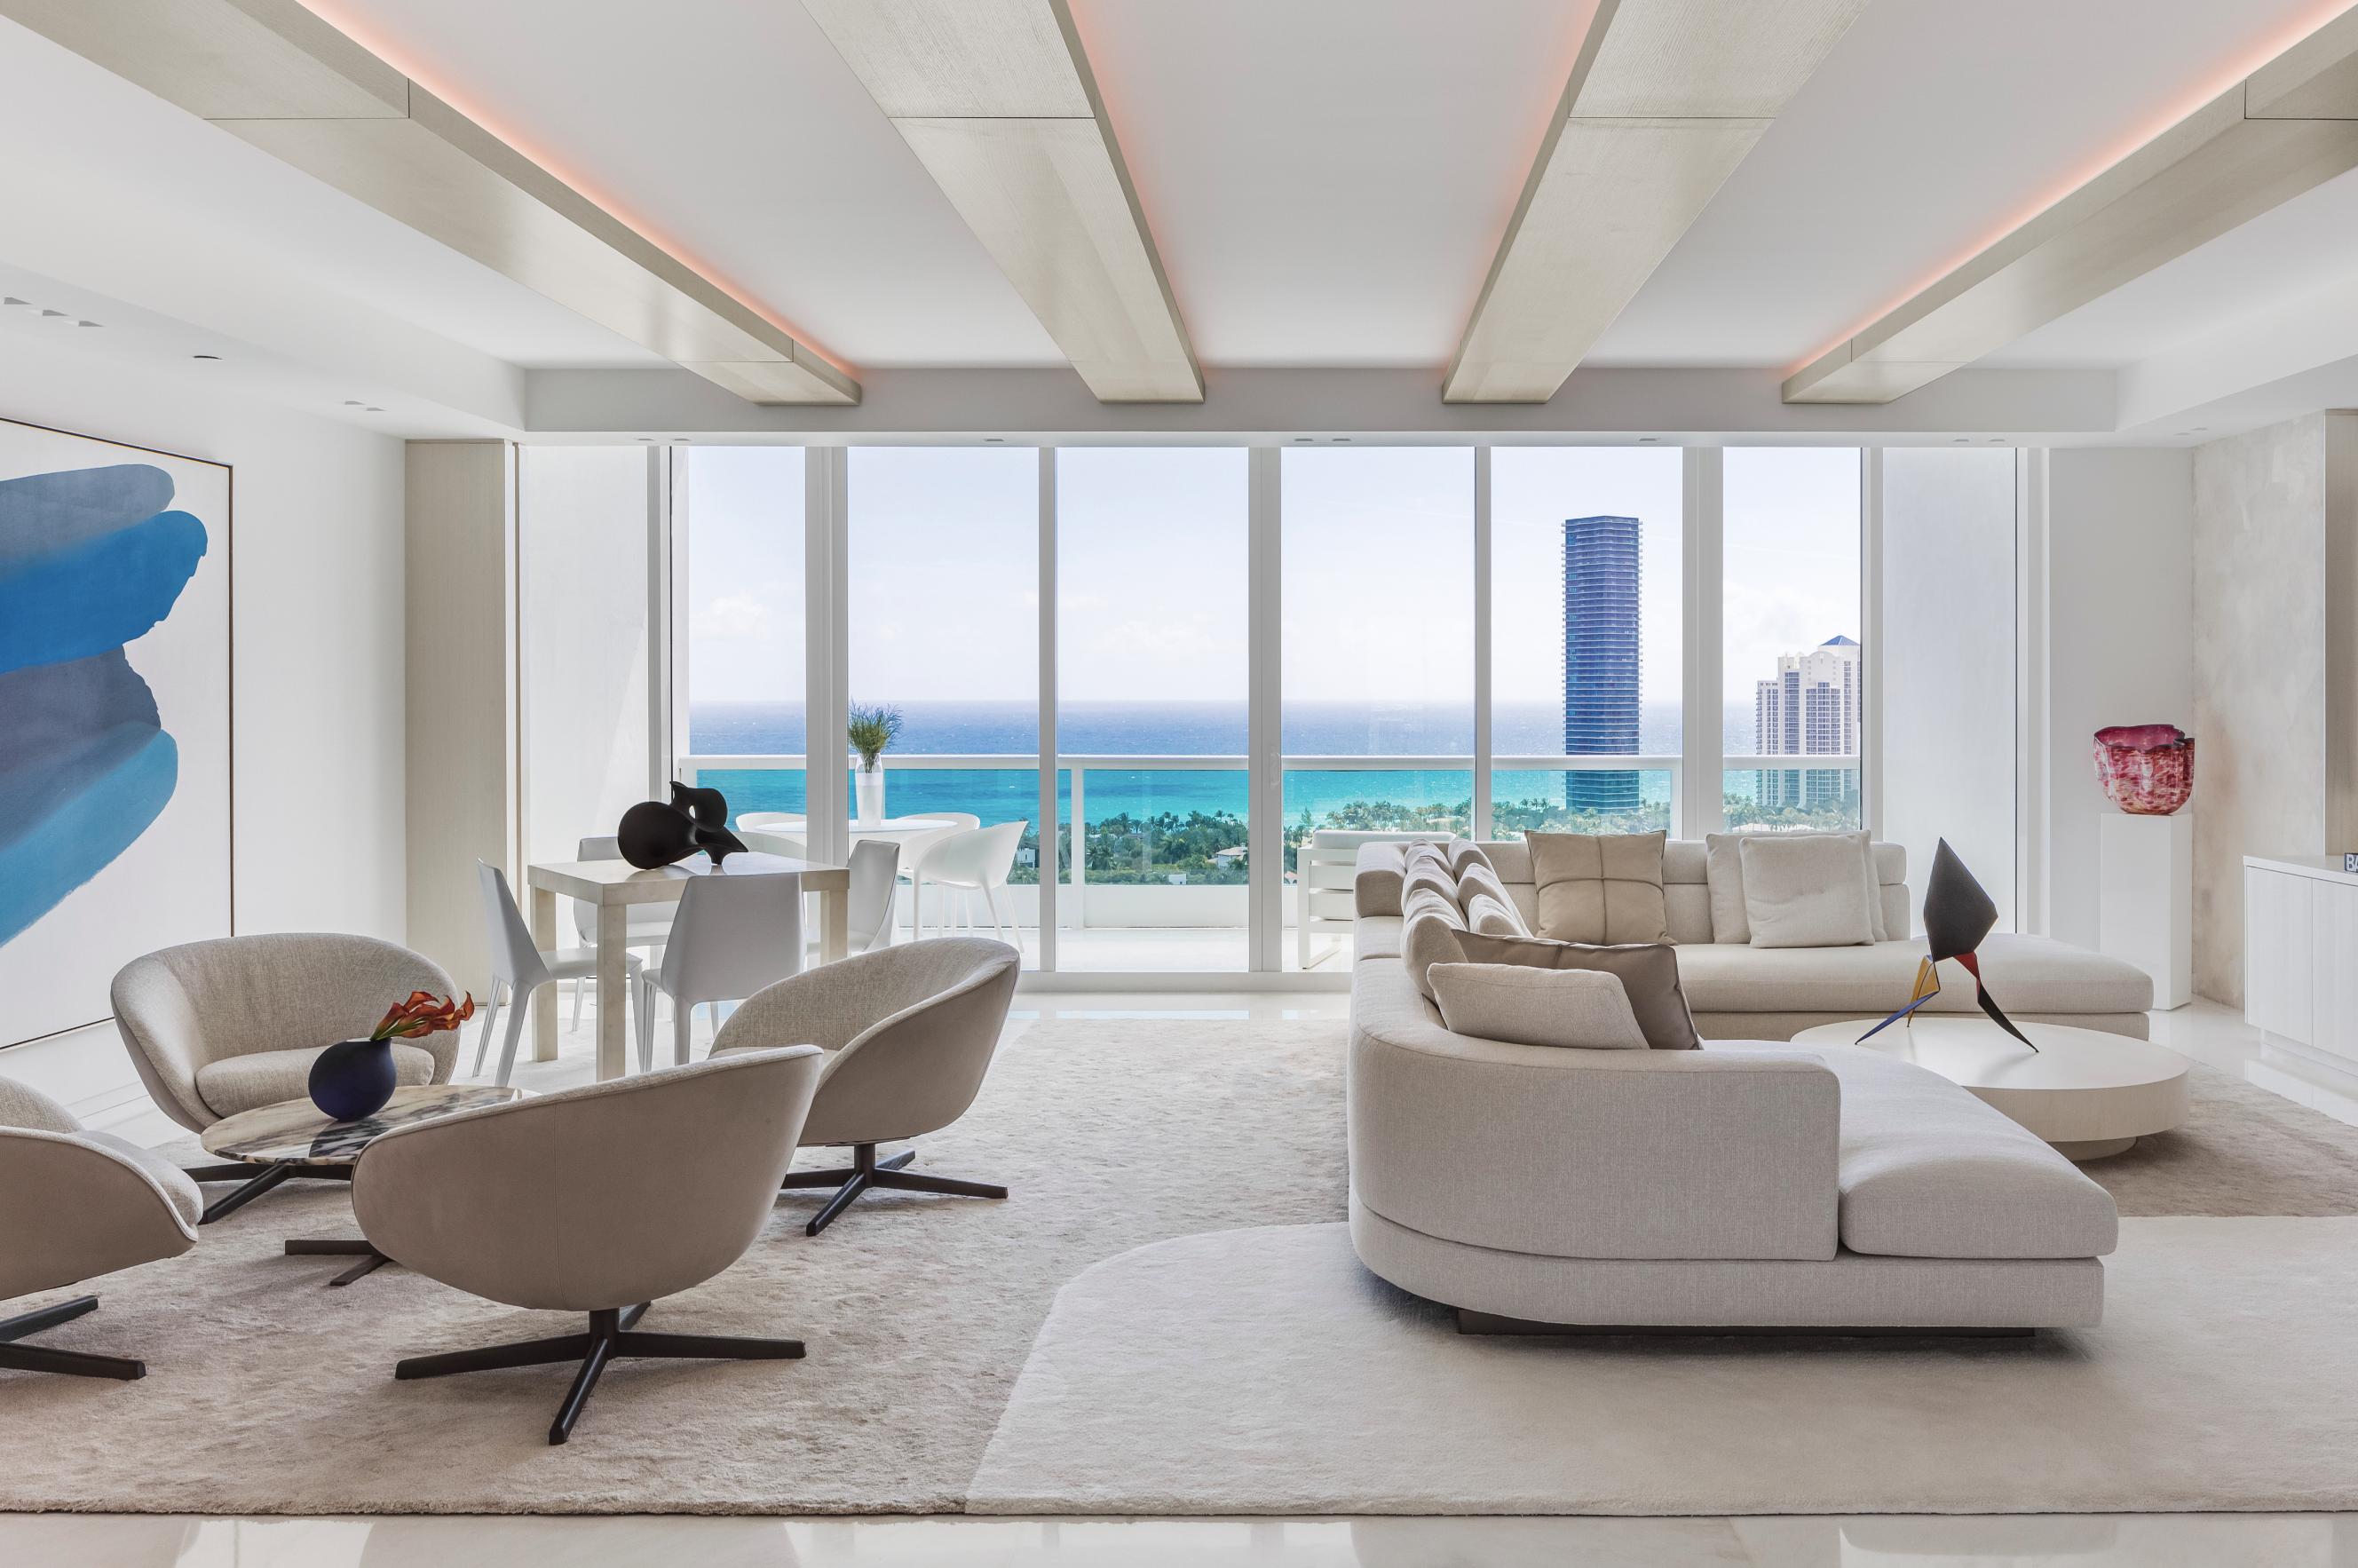 Interior Design by Tamara Feldman